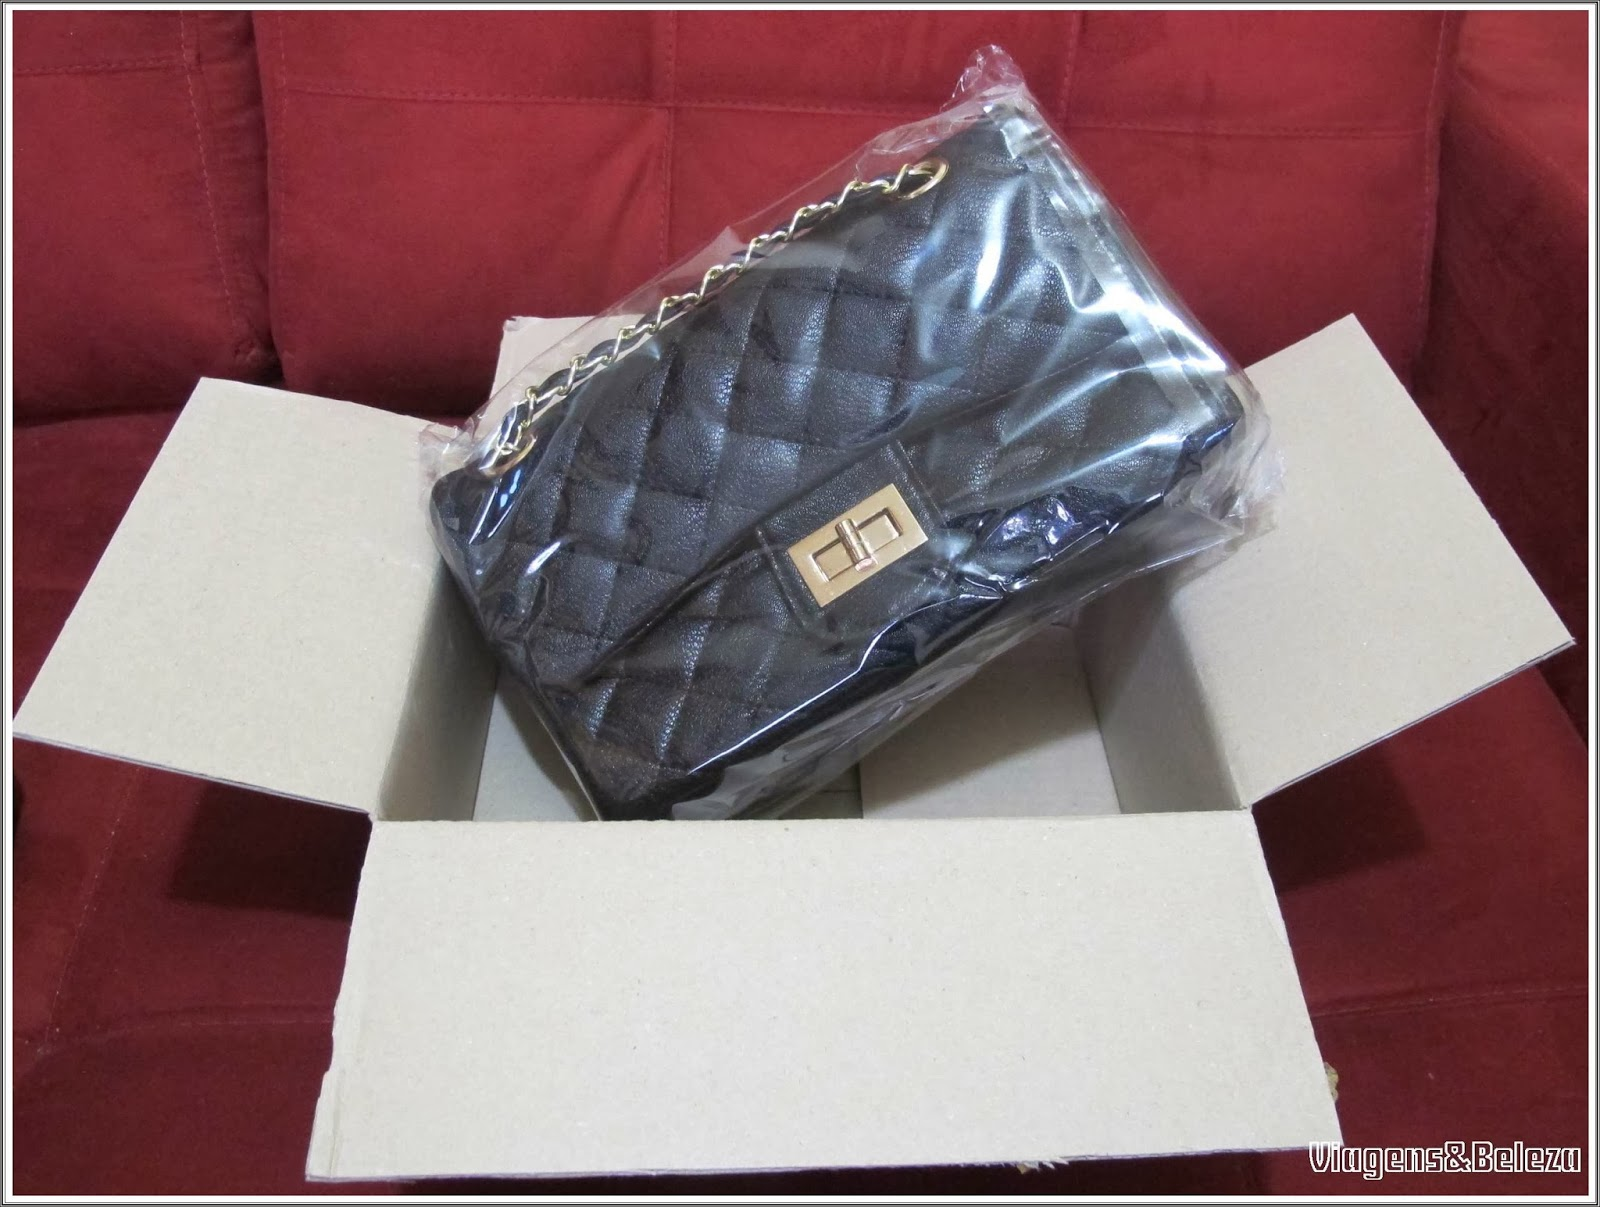 18d1db6d24c64 Compras eBay e Aliexpress - as boas e as furadas! - Viagens e Beleza